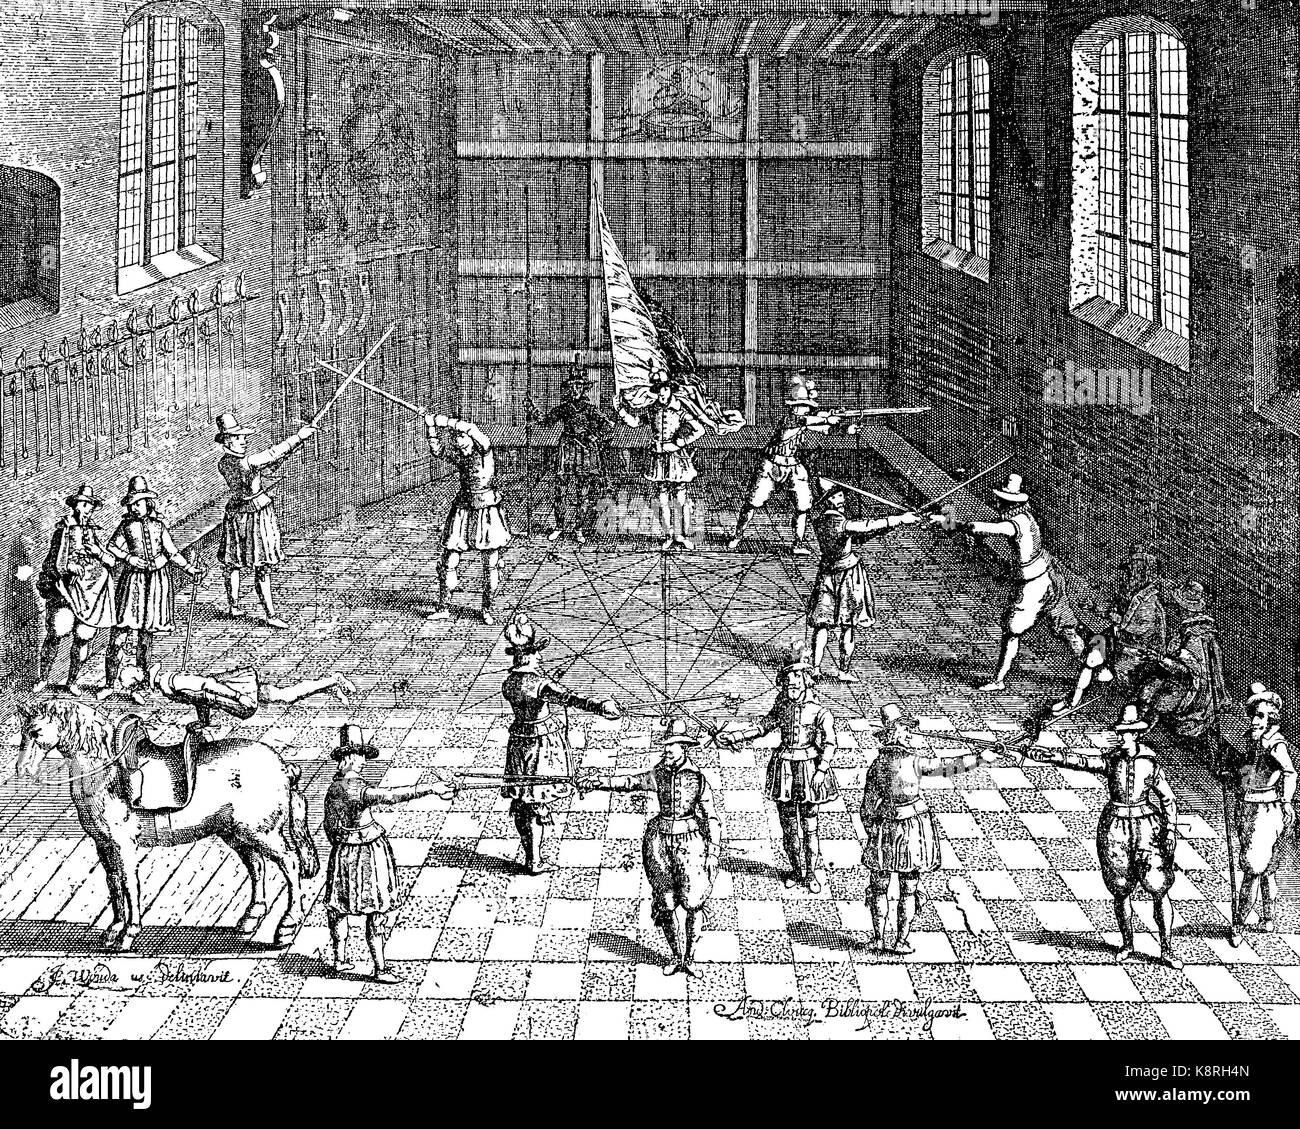 Gli studenti di scherma, Università di Leiden, Olanda, Fechtübungen der Studenten in Leiden, 1610, digital Immagini Stock